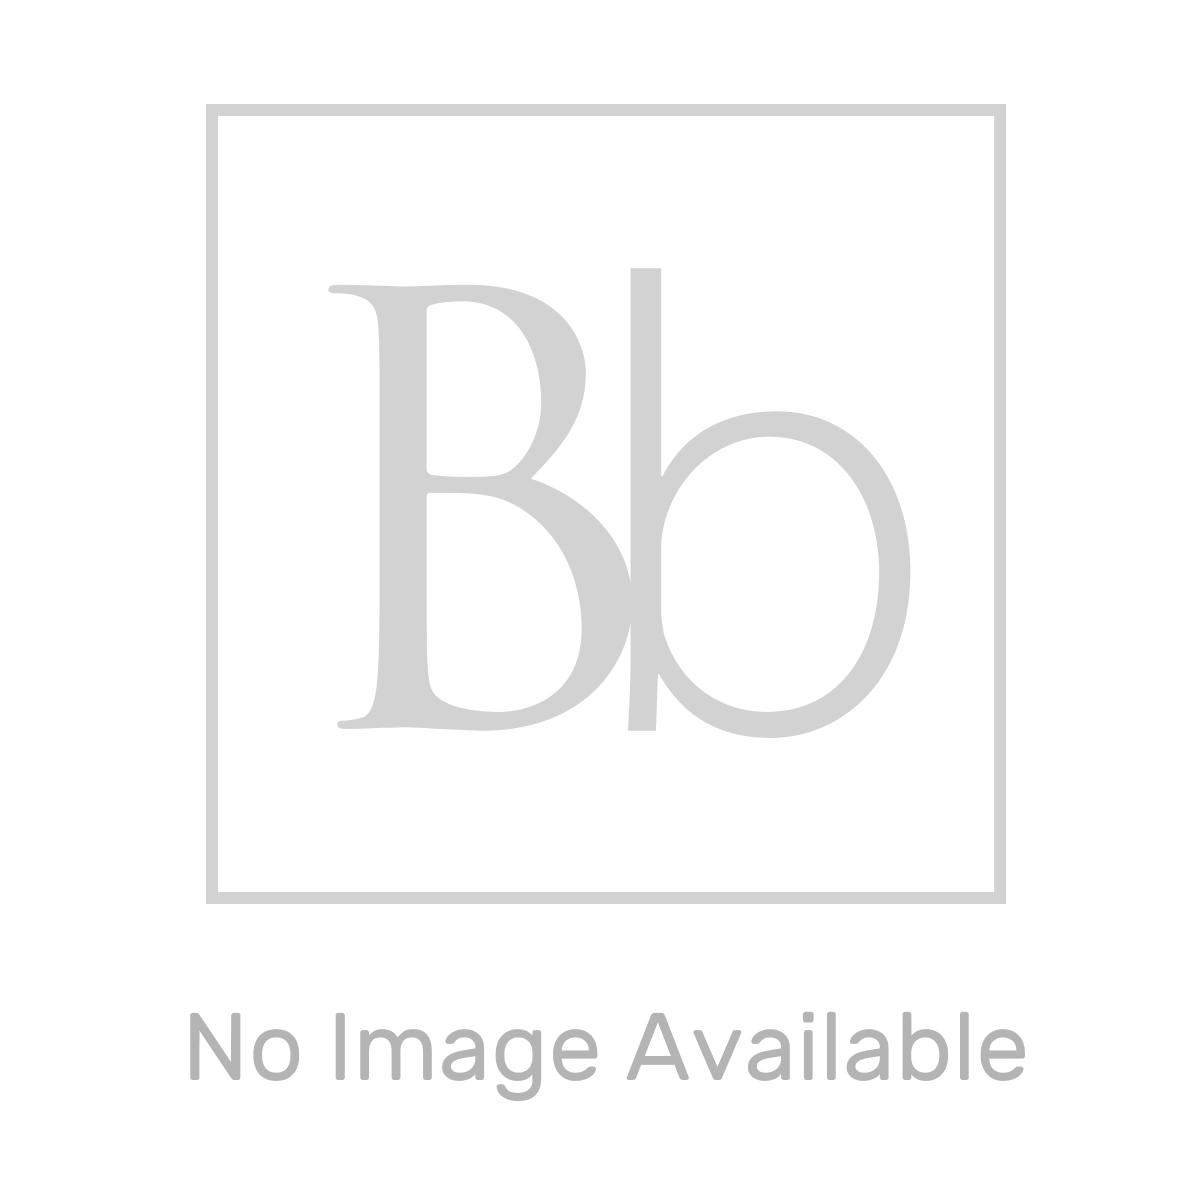 Aquadart White Slate Shower Tray 1700 x 760